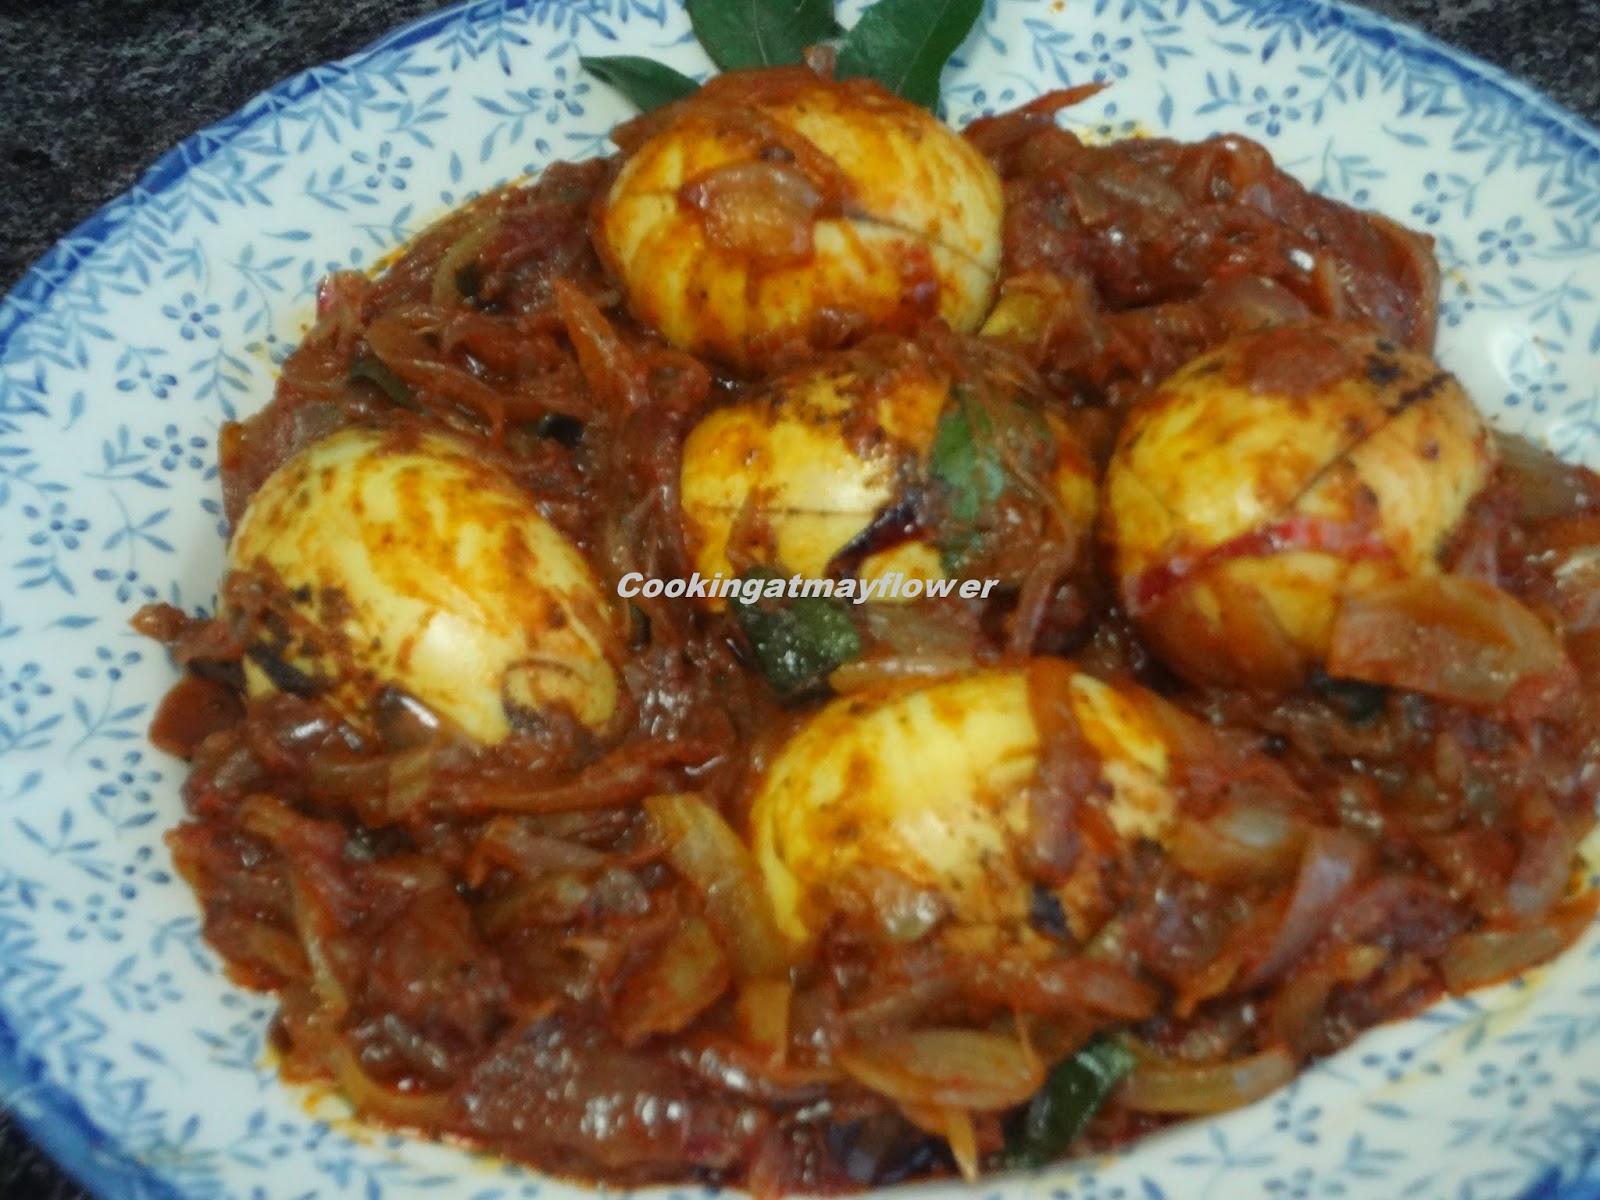 Cooking at mayflower kerala egg roast mutta roast for Cuisine kerala